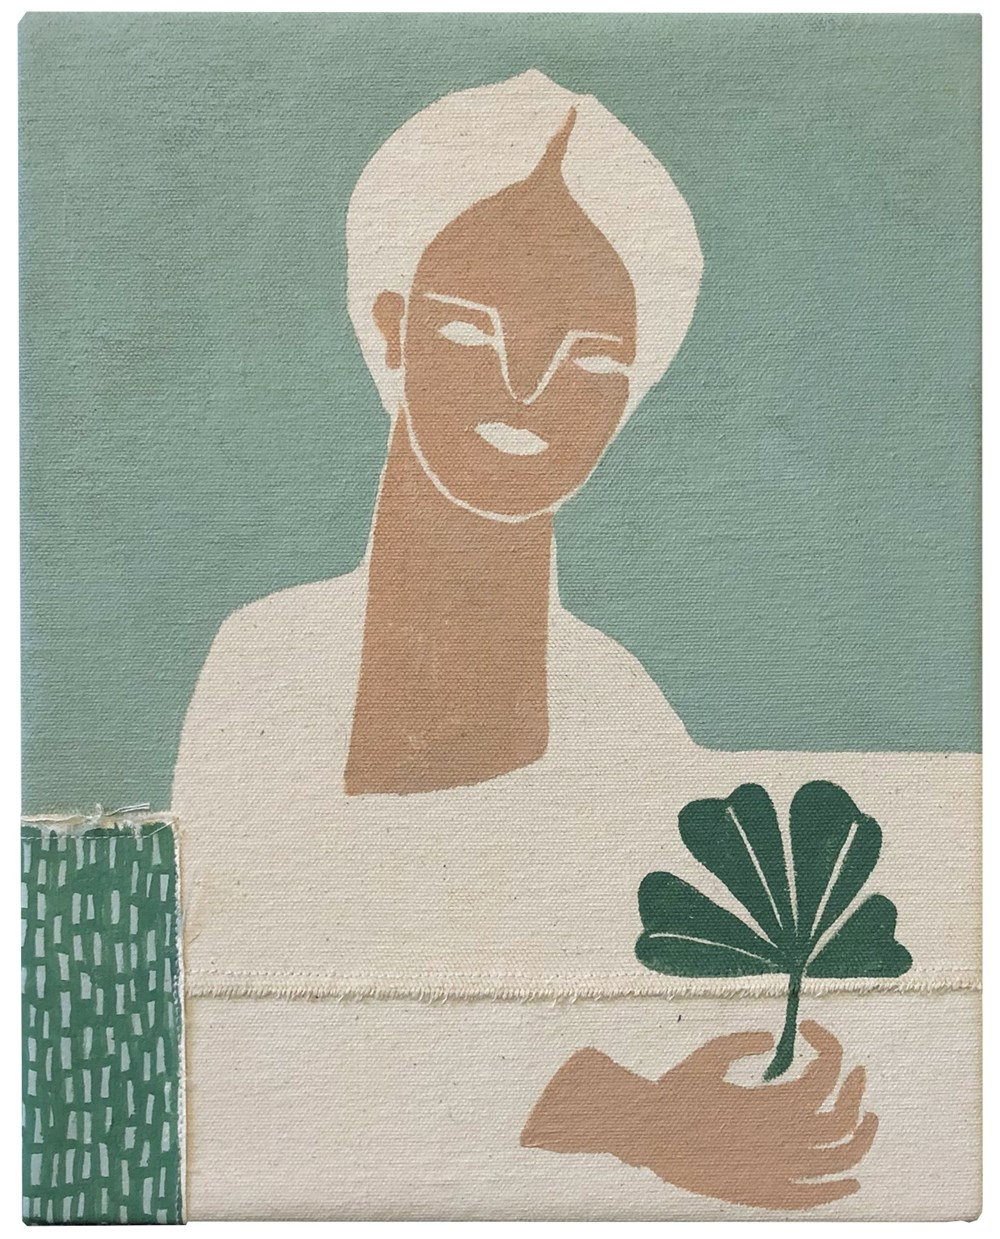 50 x £50 - Lot 44, Ali Corder, Trevaylor clovers